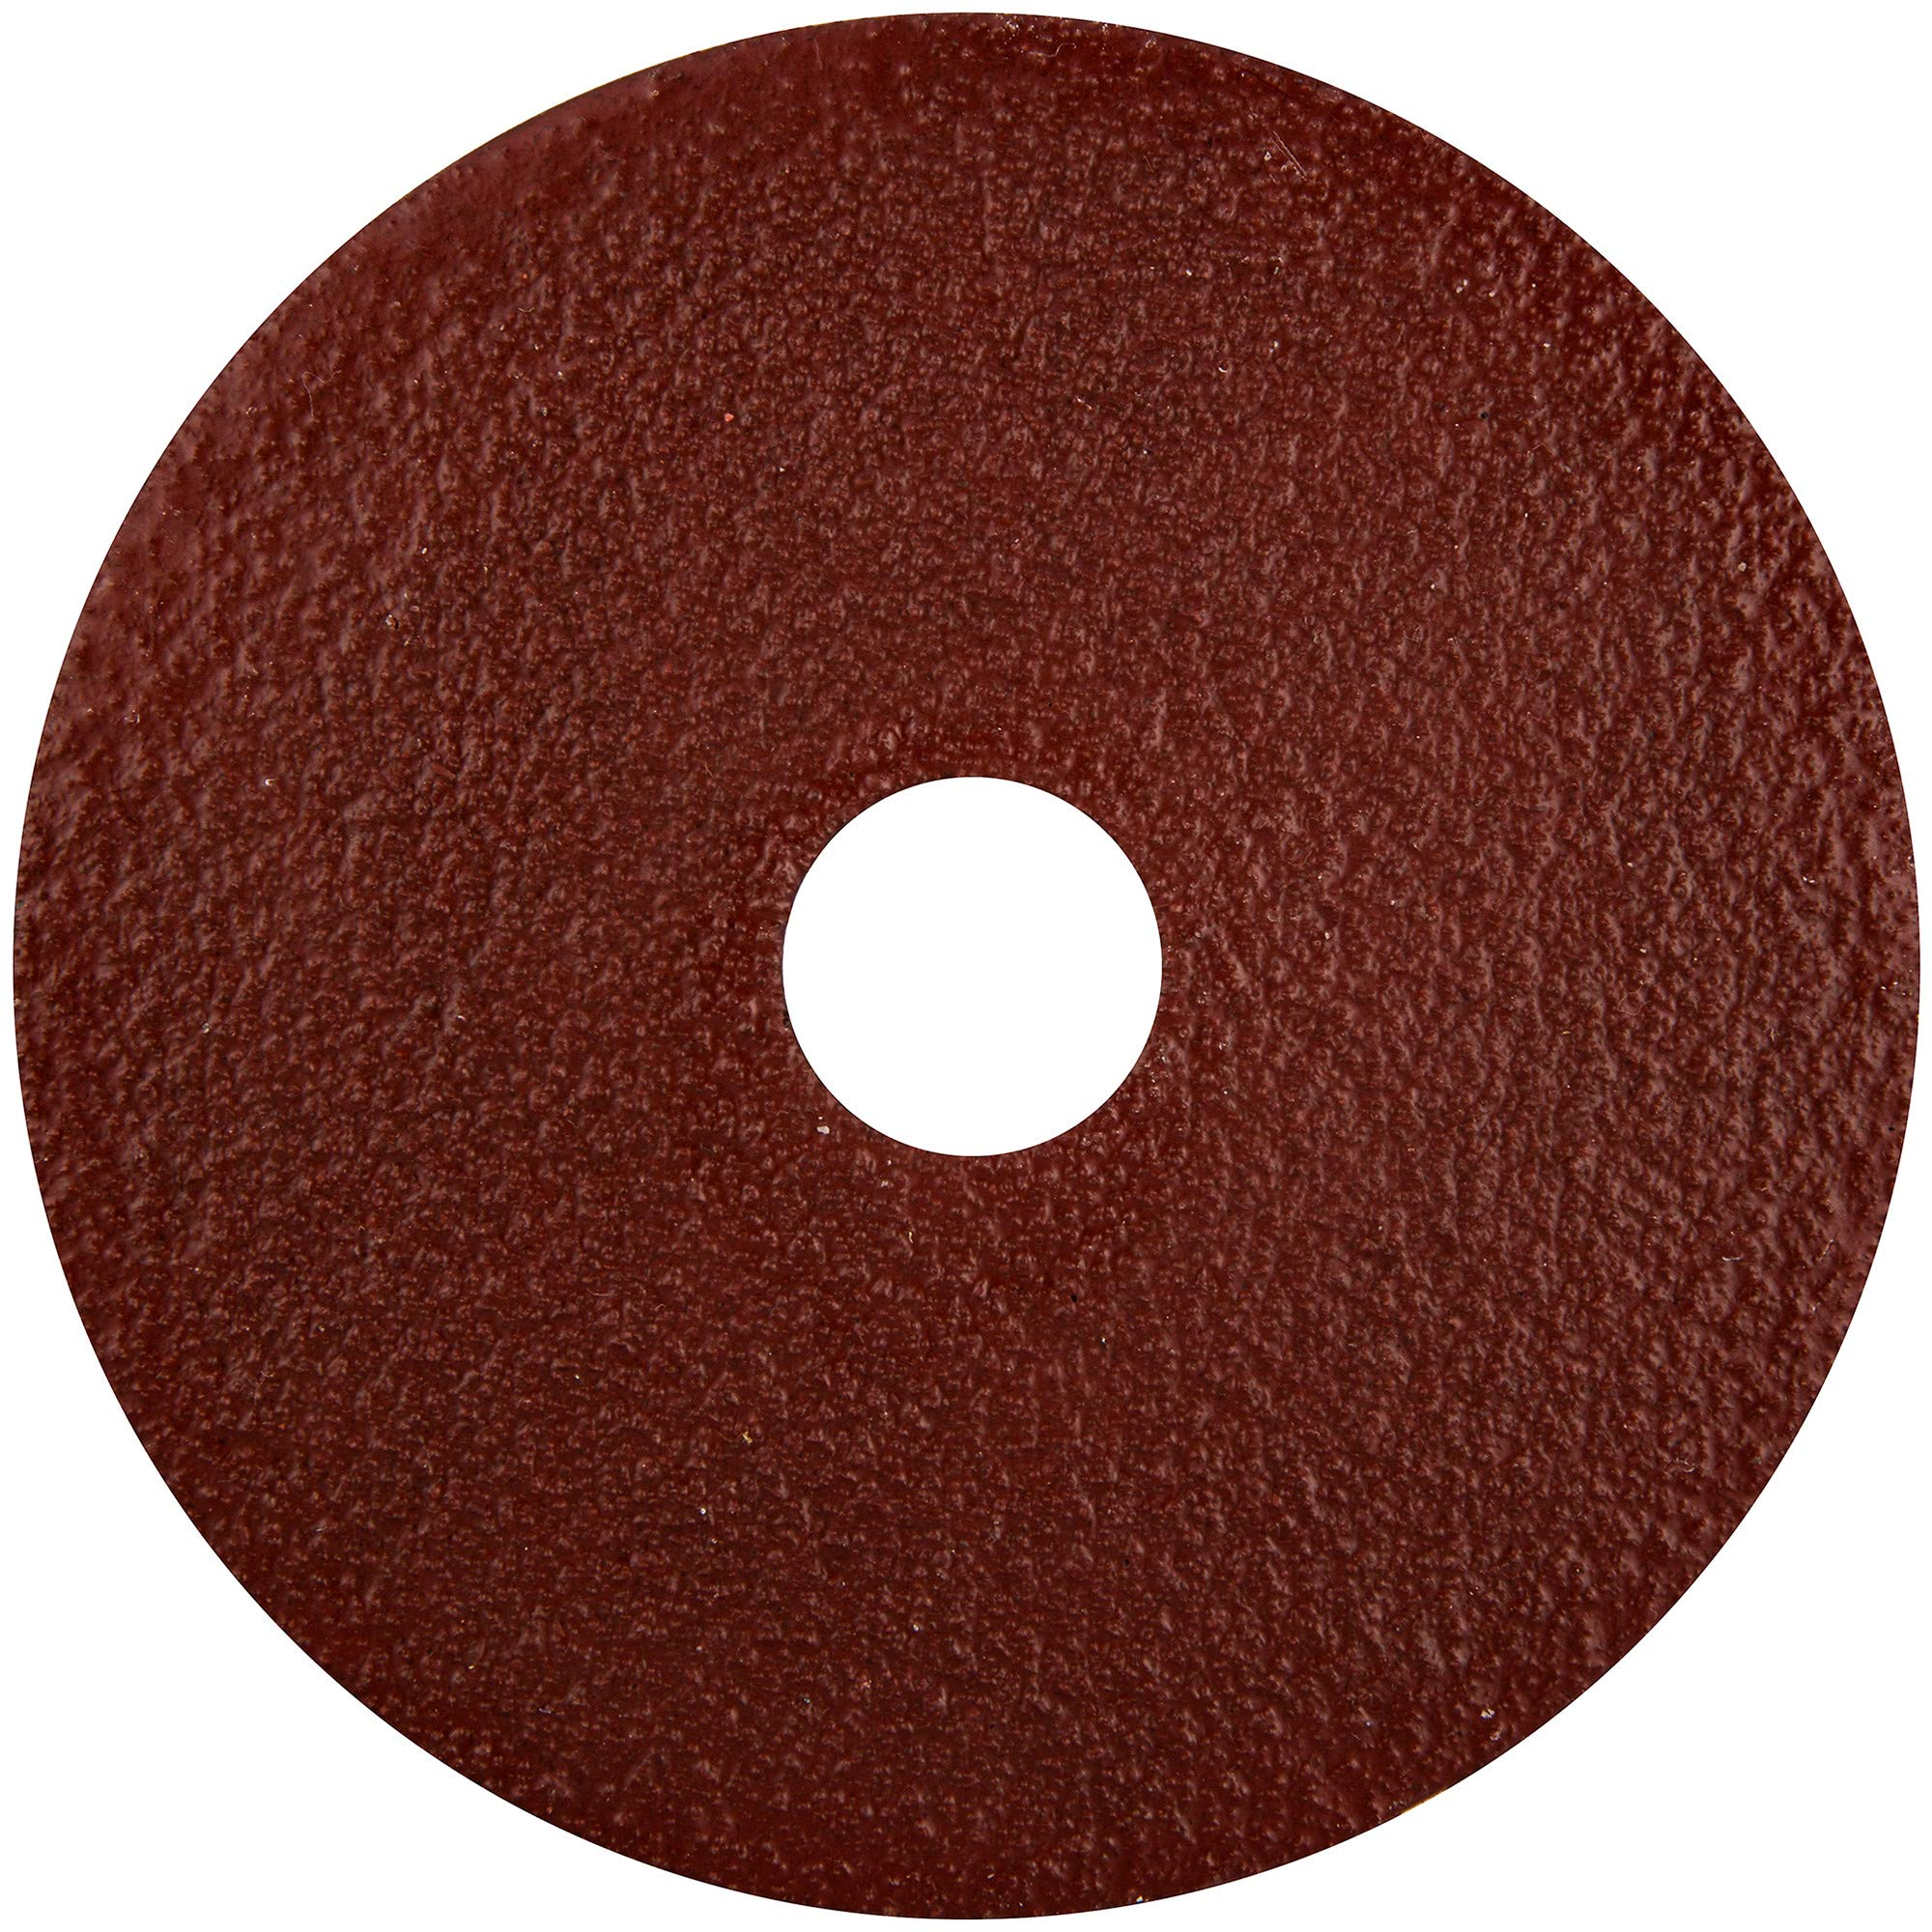 Norton Gemini Metalite F220 Abrasive Disc, Fiber Backing, Aluminum Oxide, 7/8'' Arbor, 4-1/2'' Diameter, Grit 80 (Pack of 25)